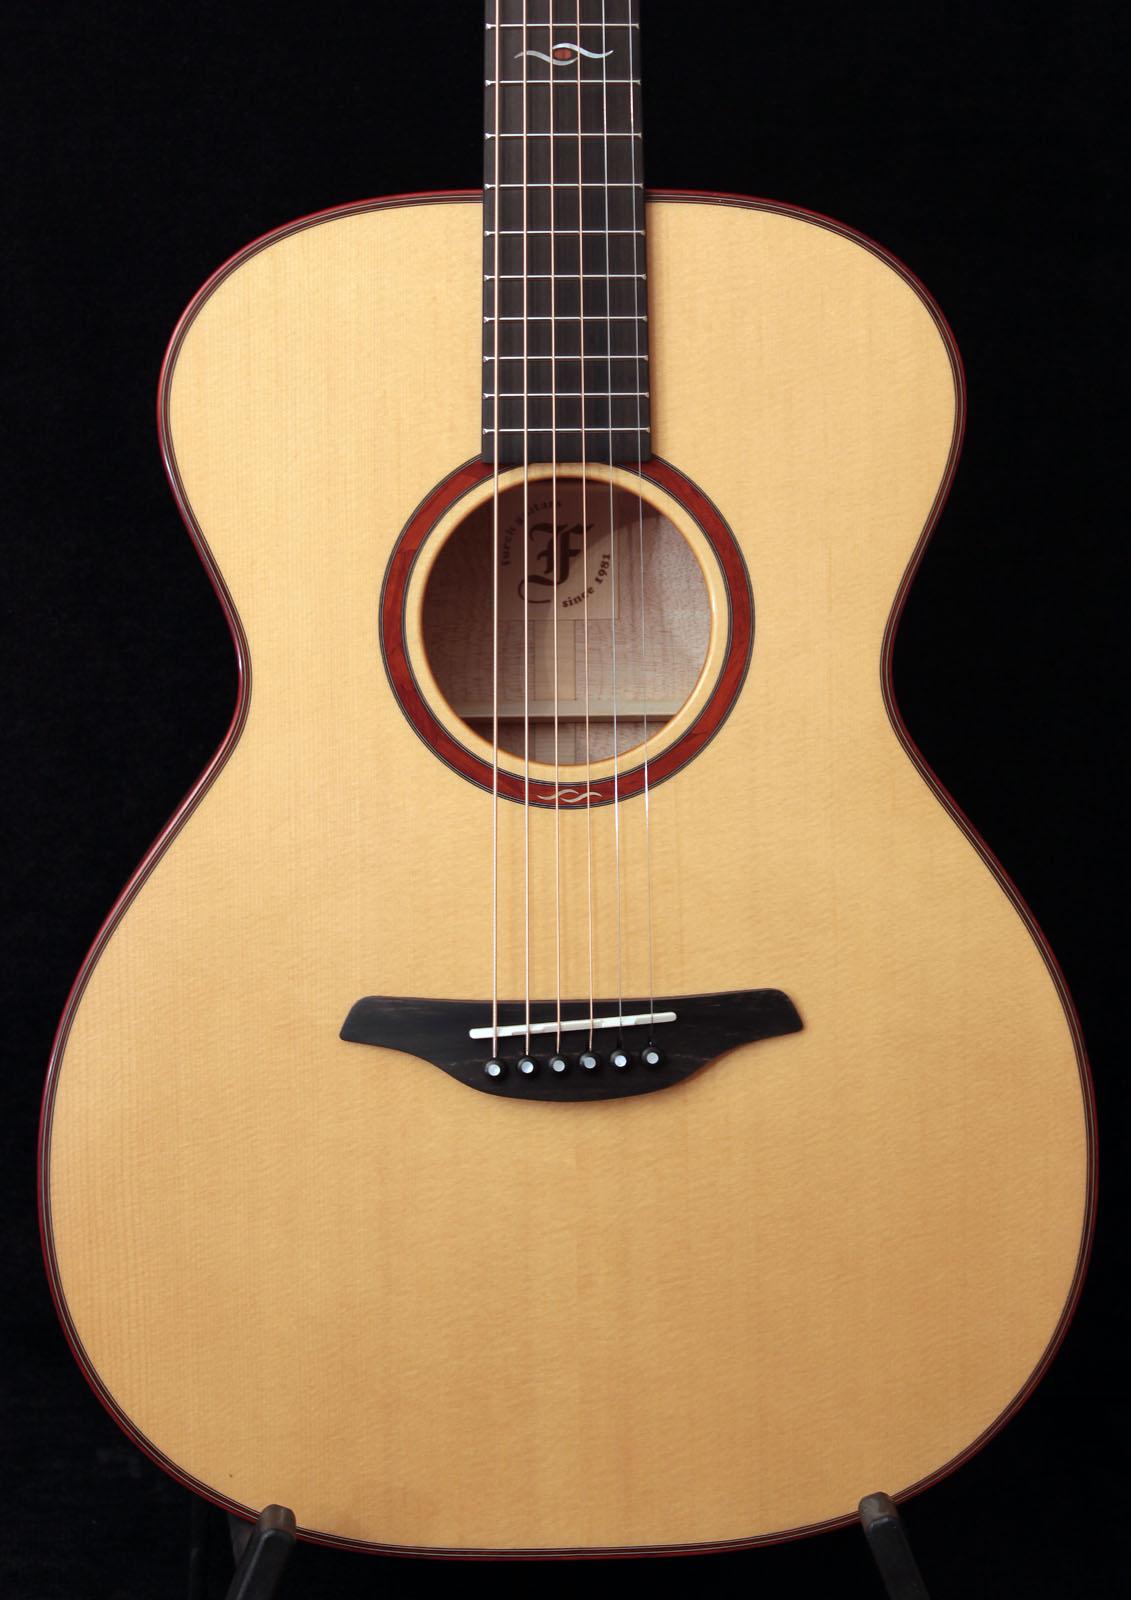 furch om24 sf 2013 high gloss guitar for sale stageshop kft. Black Bedroom Furniture Sets. Home Design Ideas